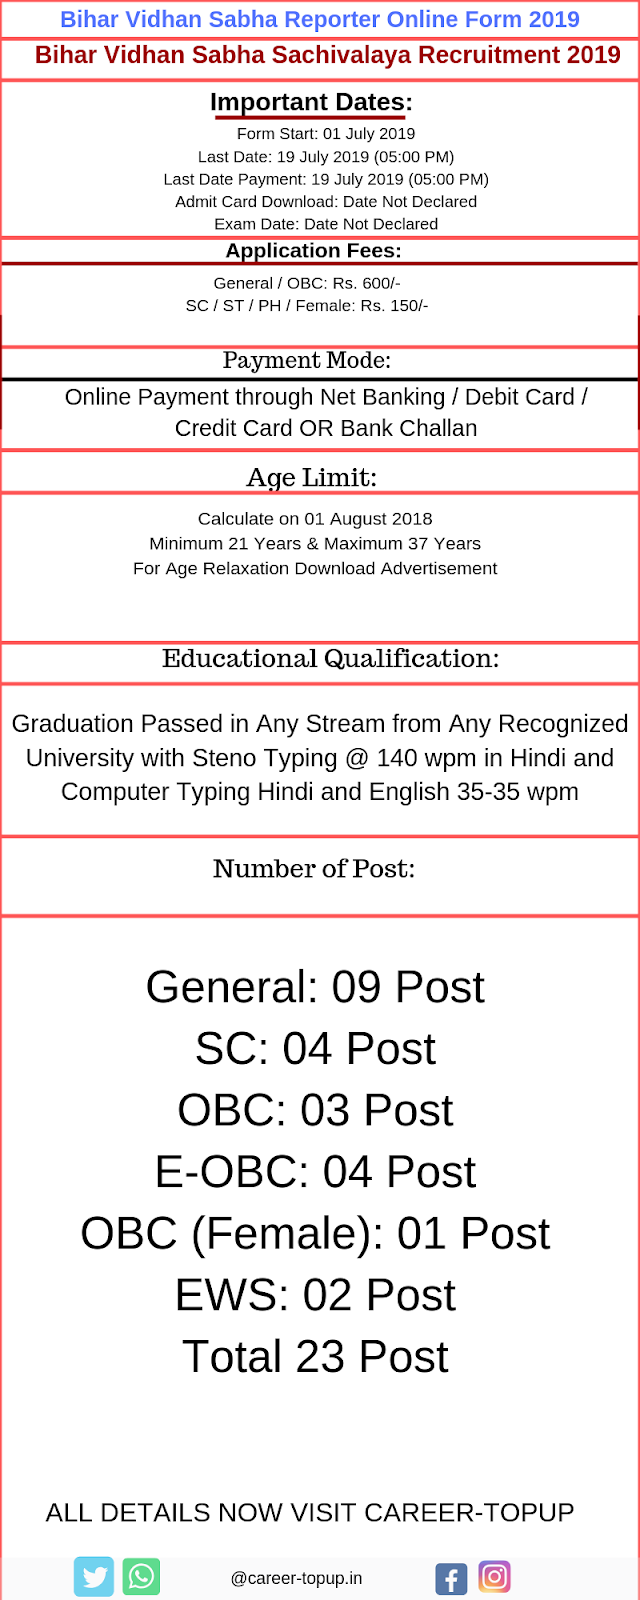 Bihar Vidhan Sabha Reporter Online Application Form 2019